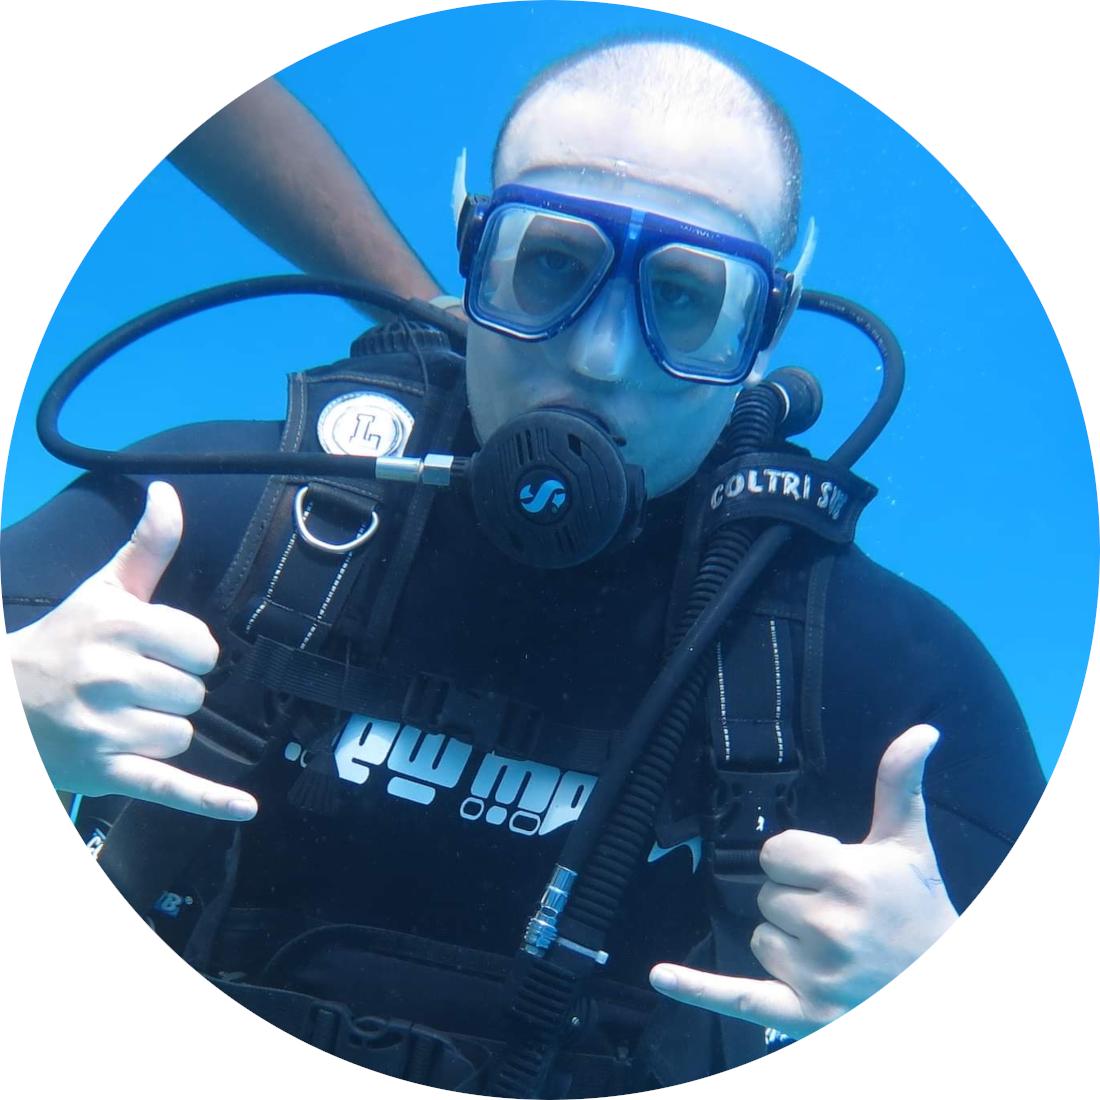 Yanko loves diving